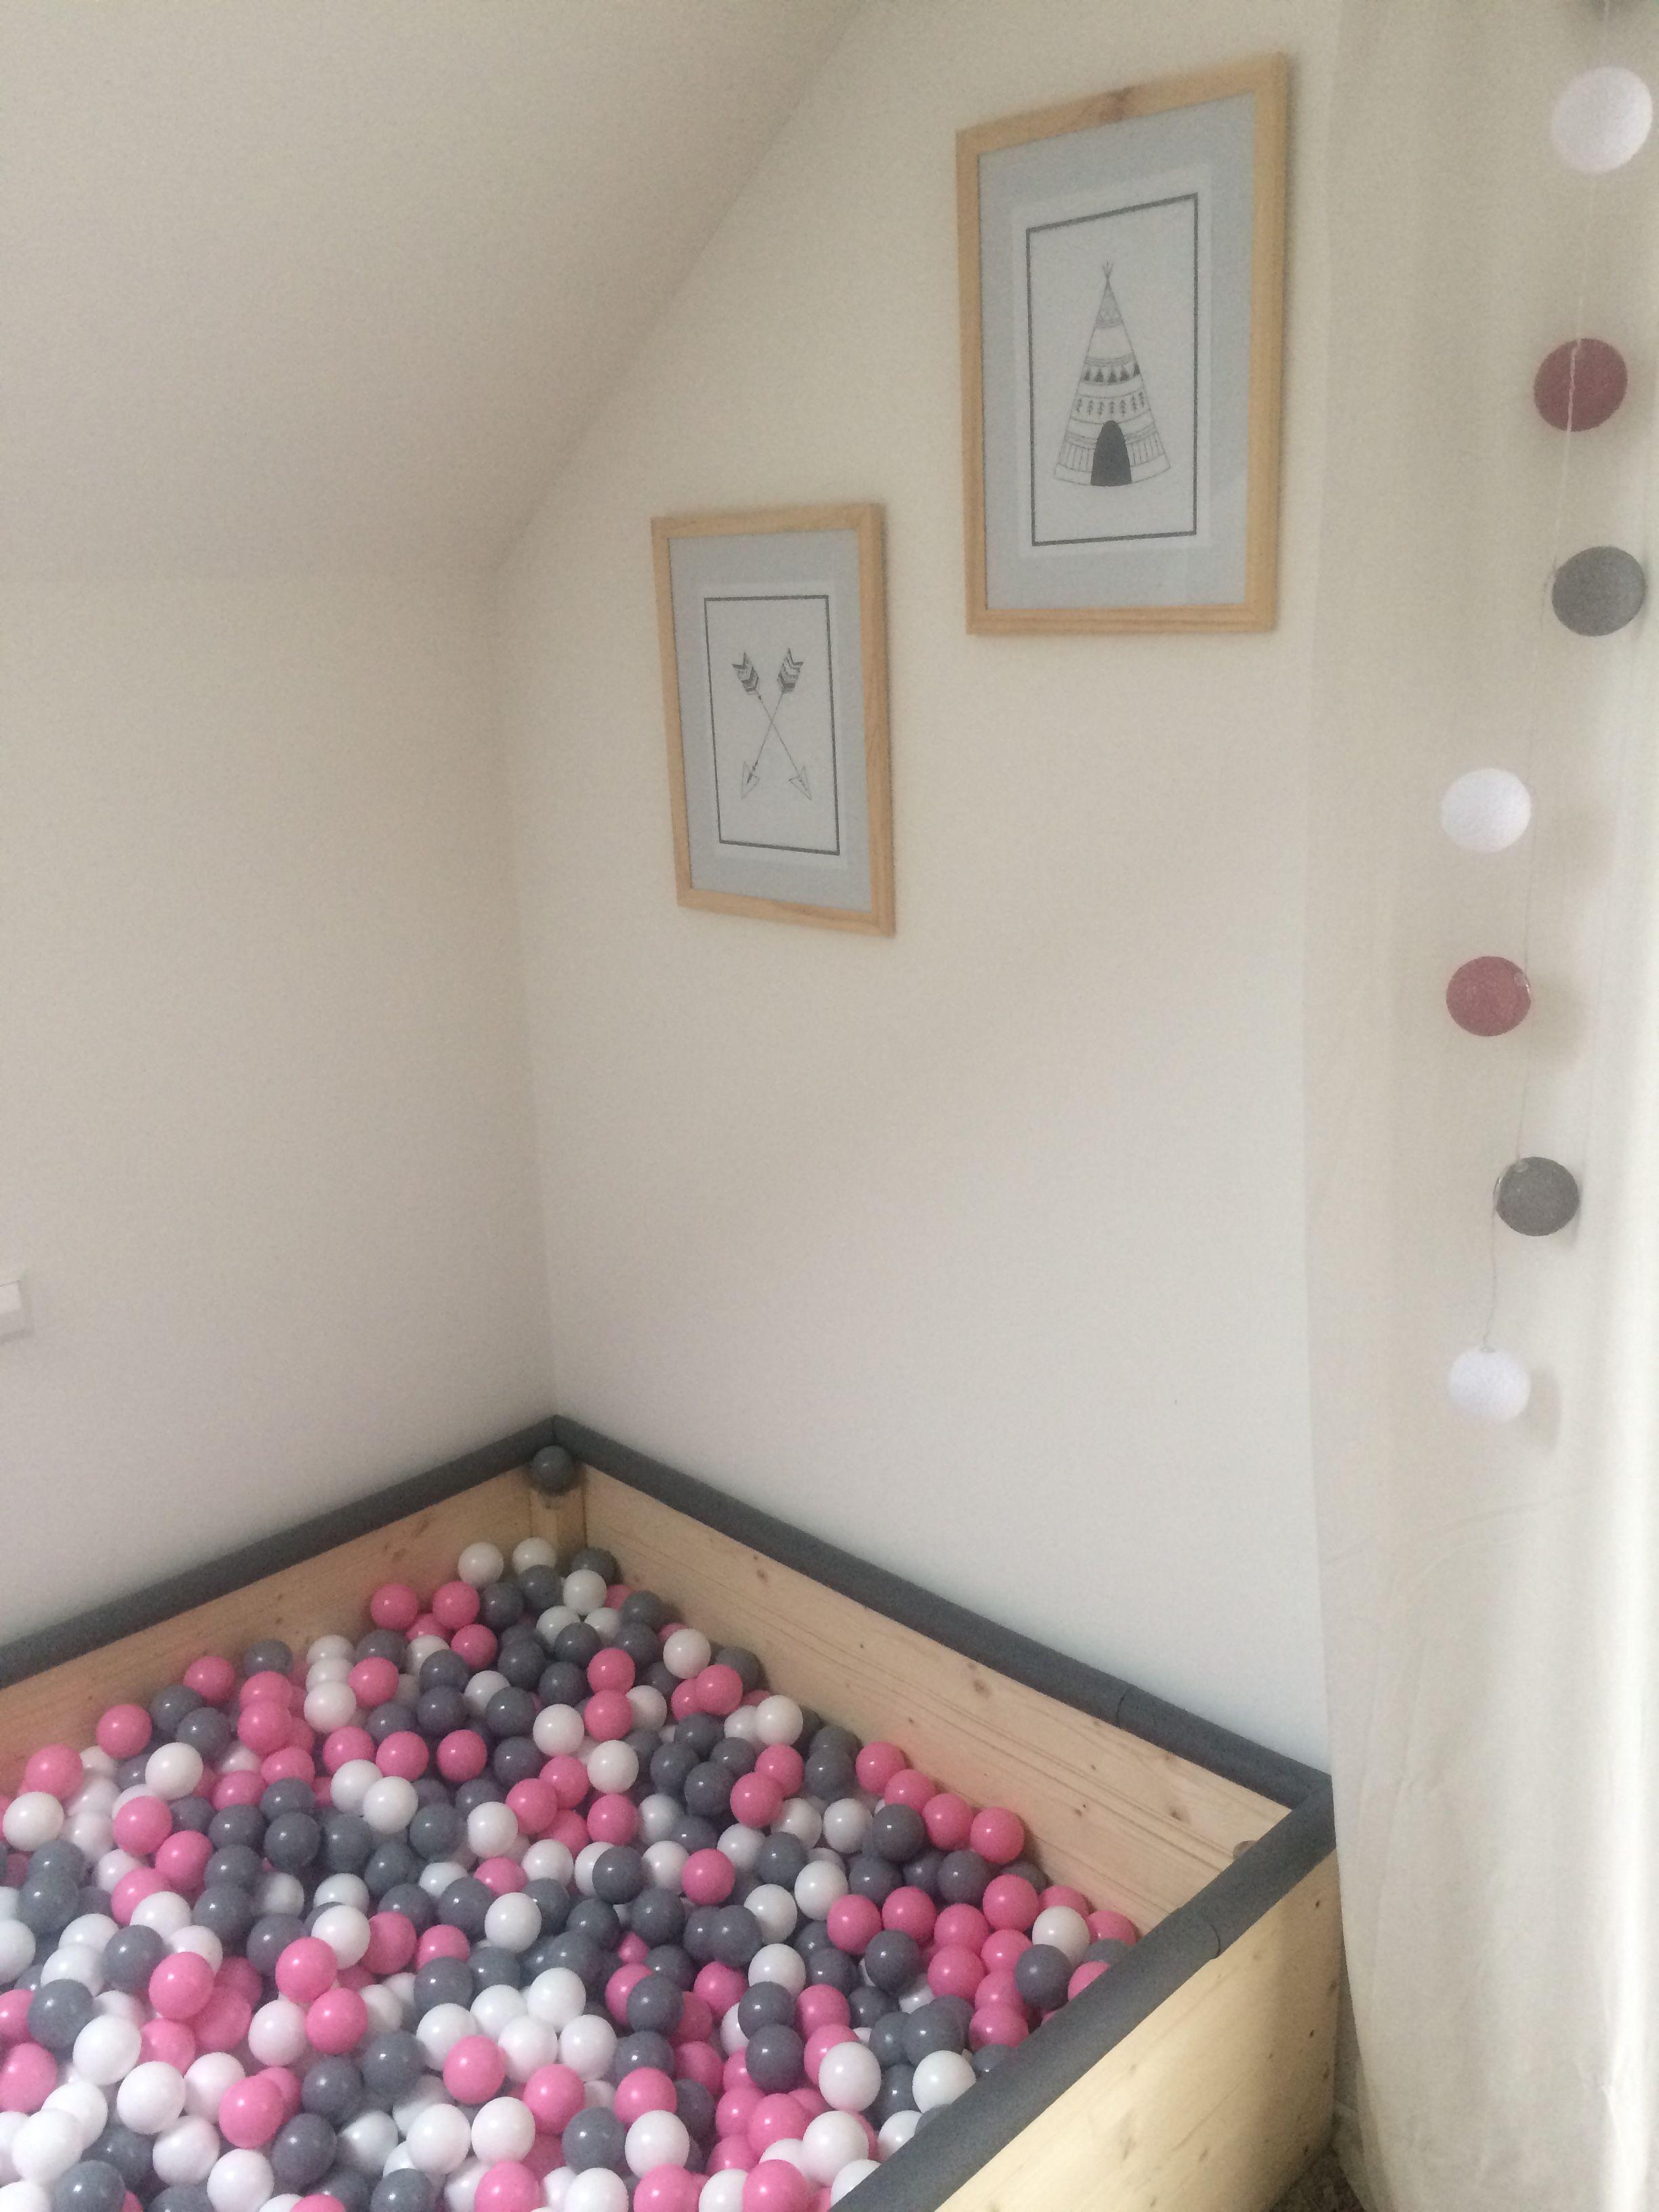 Kinderzimmer Bällebad Tipi Mädchenzimmer Pfeile Bilder